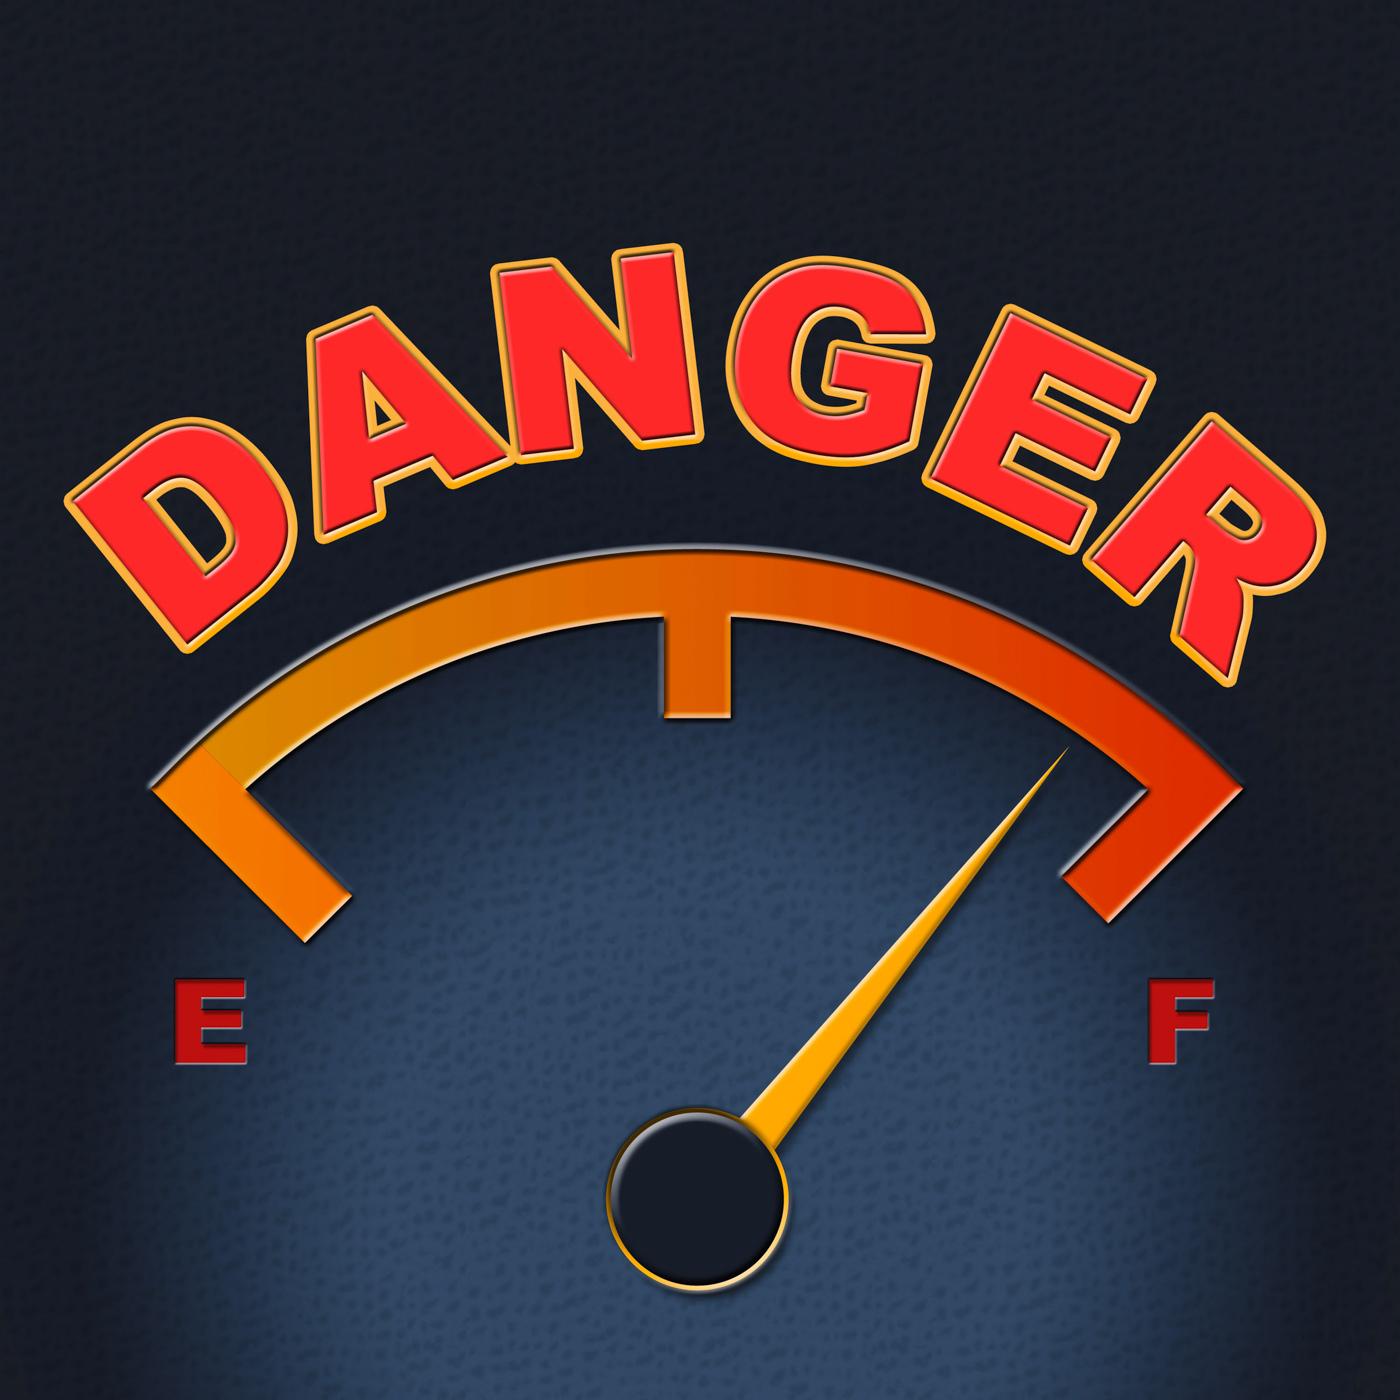 Danger gauge indicates caution dangerous and measure photo